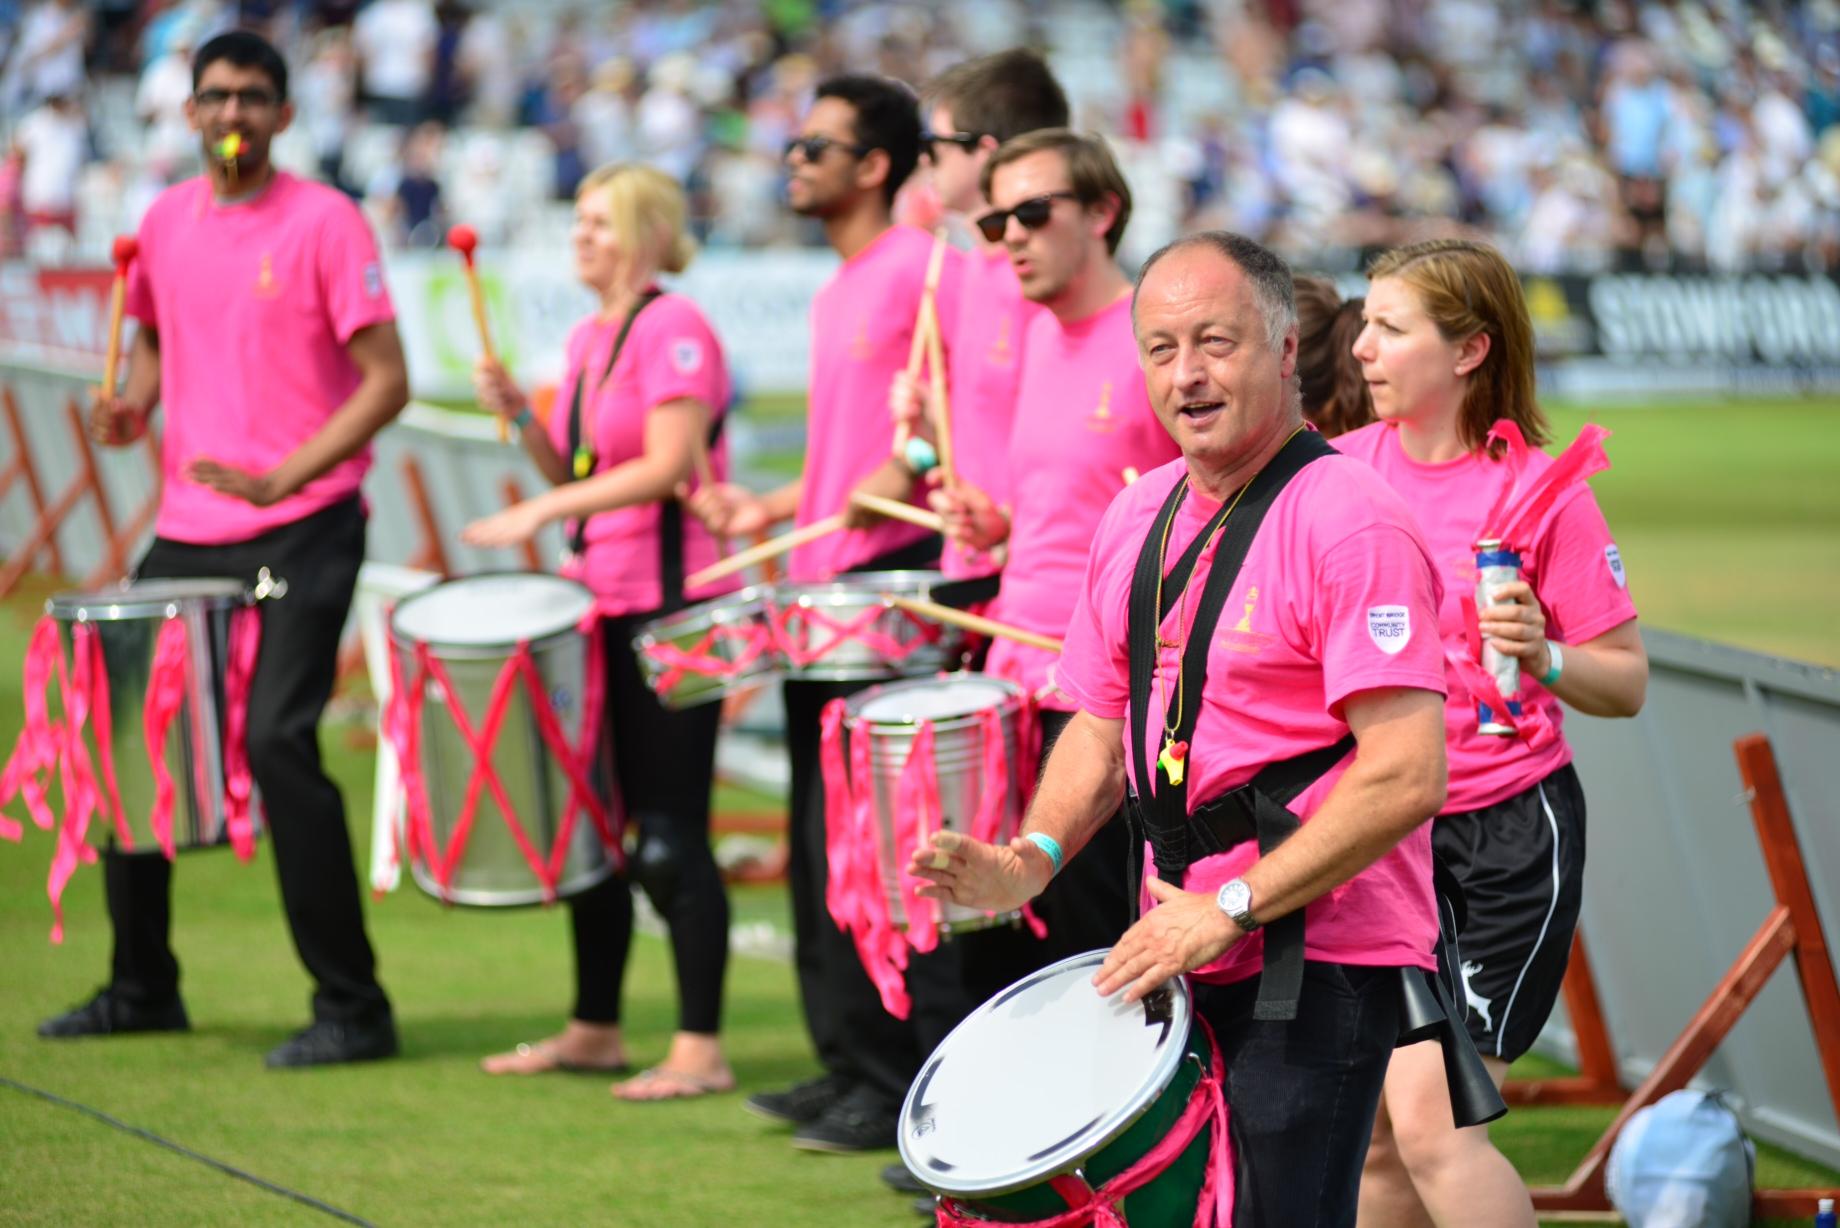 Samba Drummer